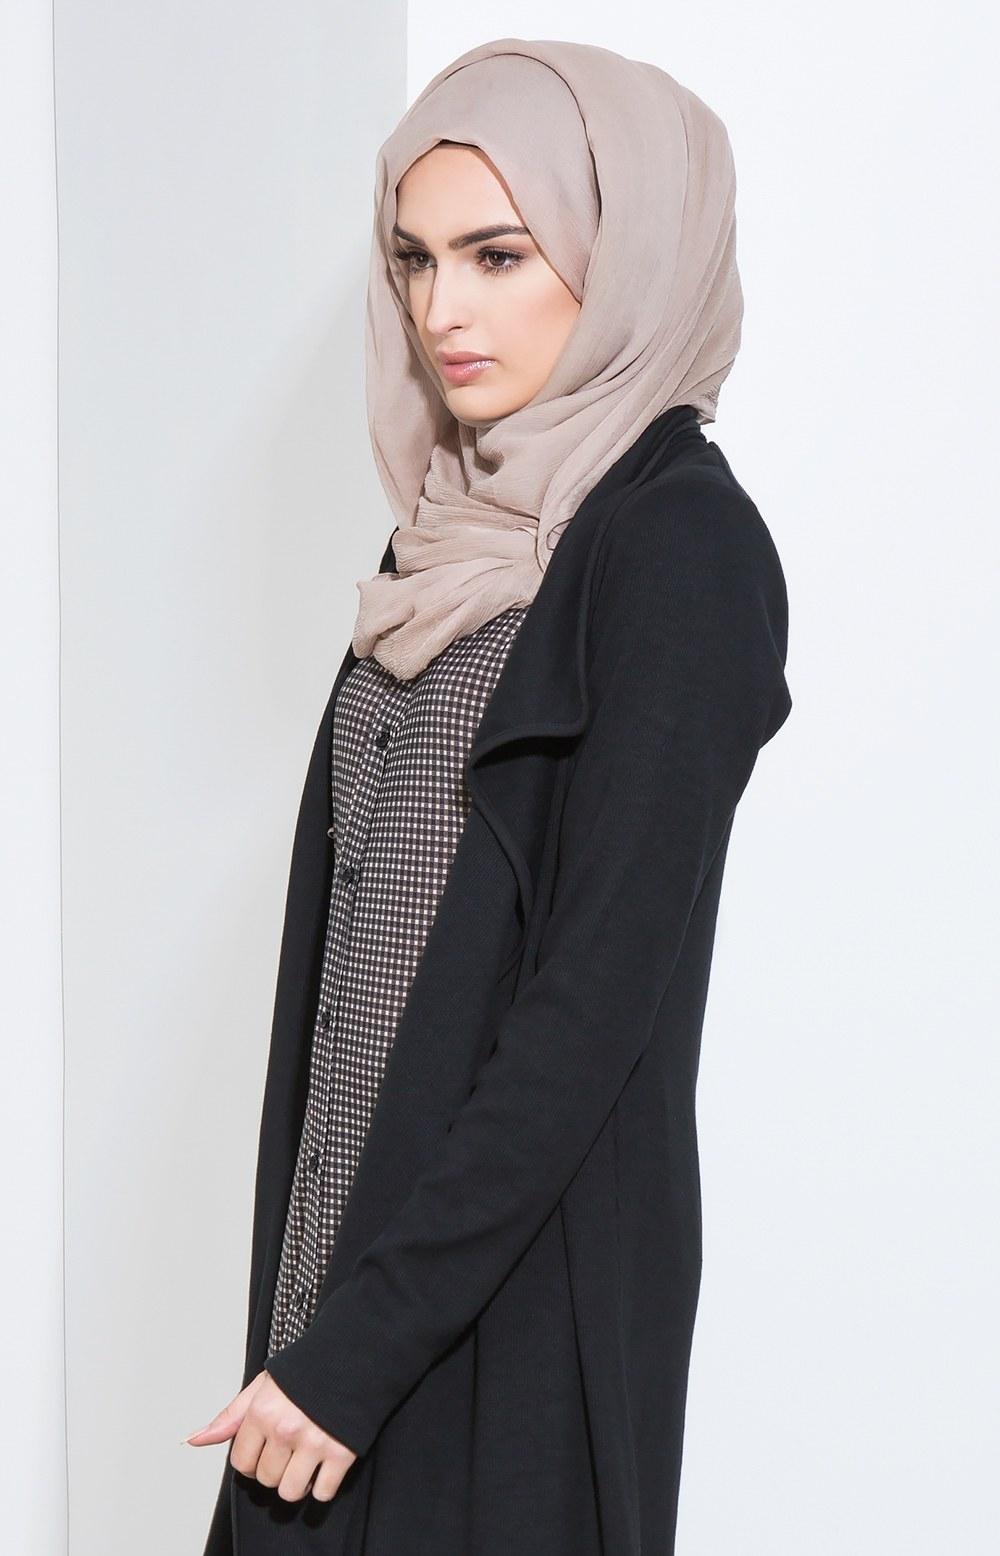 Bentuk Model Baju Lebaran Thn Ini Wddj 25 Trend Model Baju Muslim Lebaran 2018 Simple & Modis